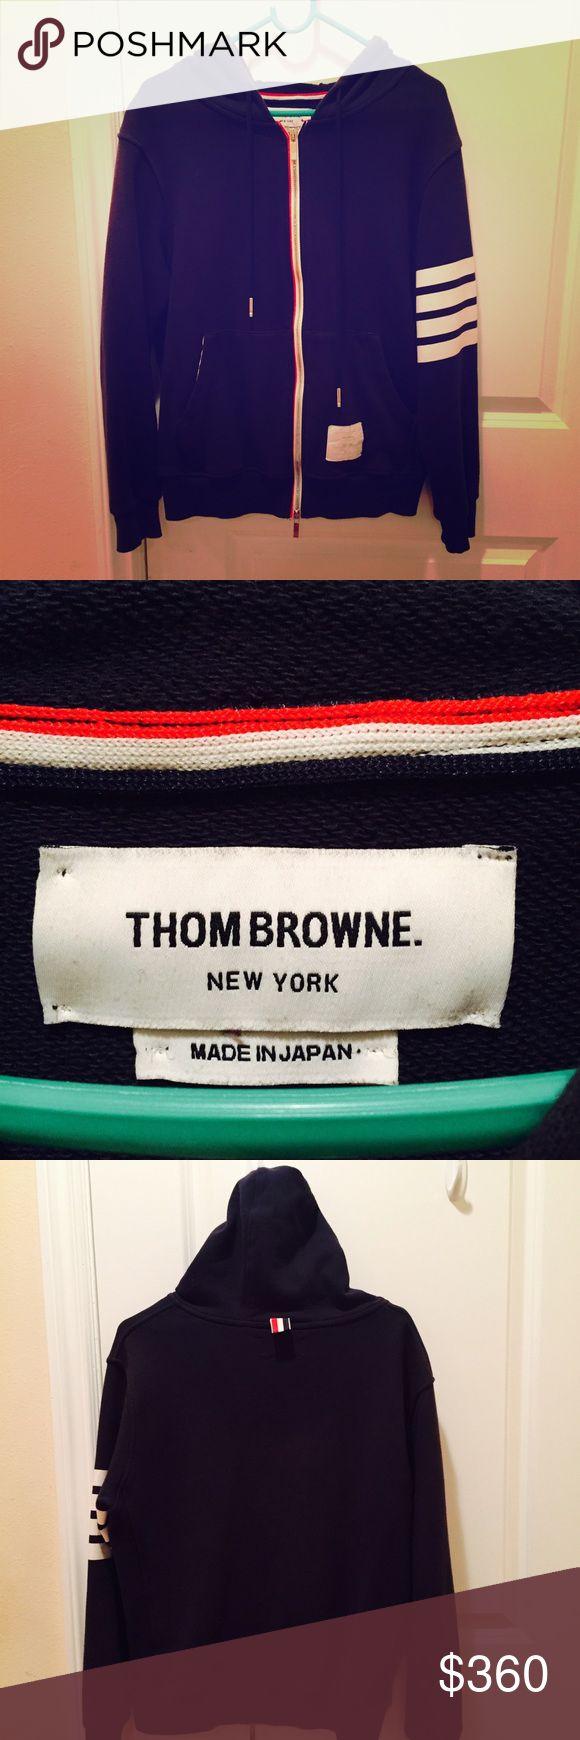 Thom Browne Jacket Clearance sale! Thom Browne Jackets & Coats